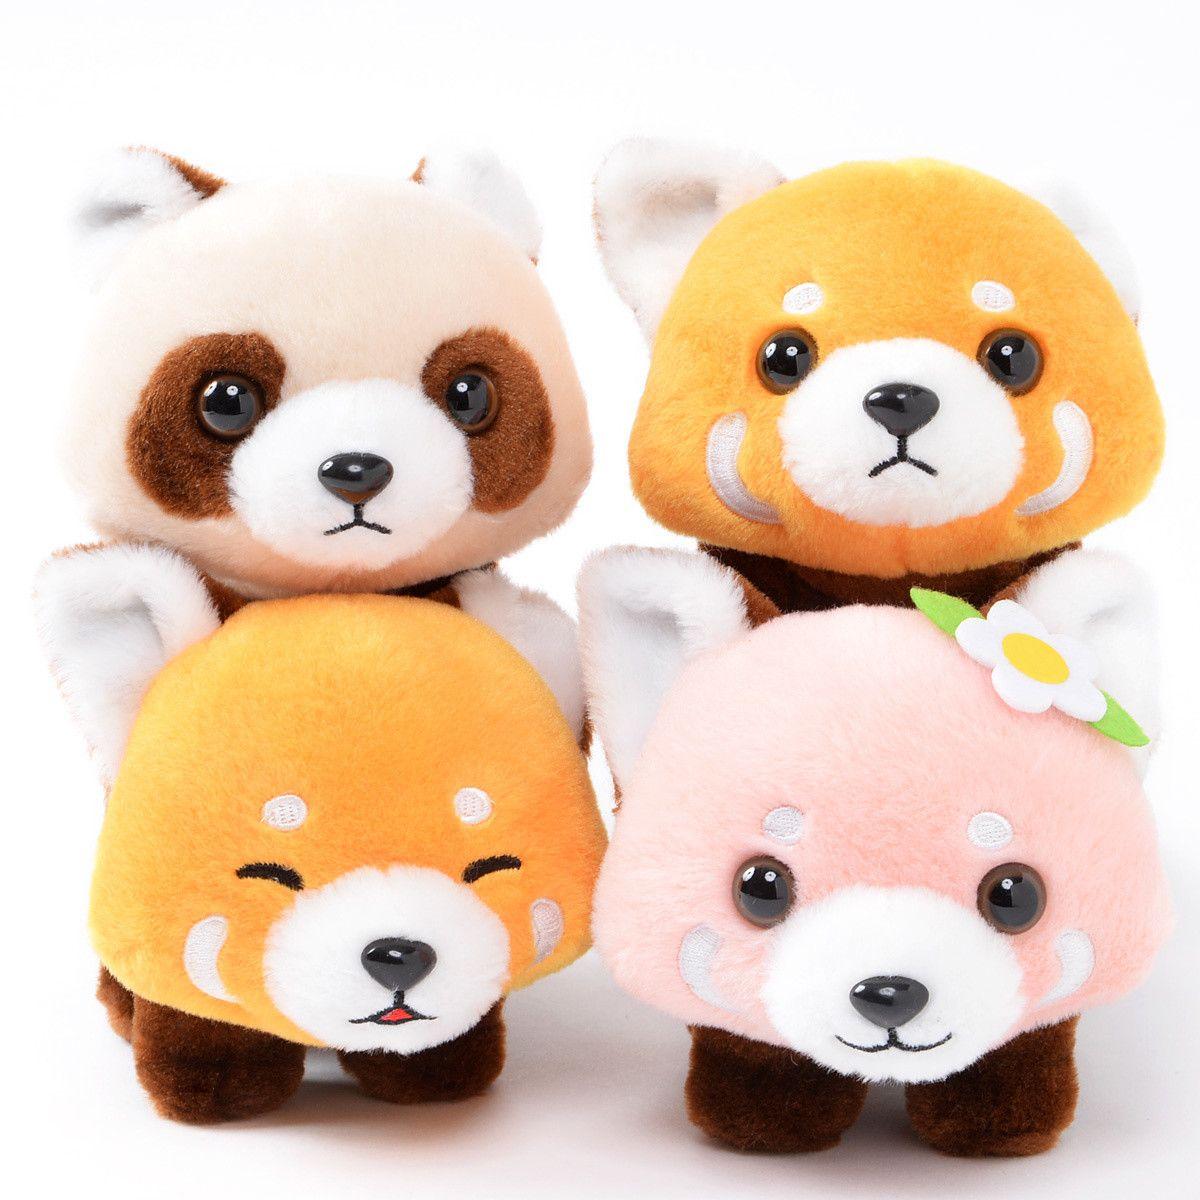 Lesser Pandachan Yochiyochi Red Panda Plush Collection